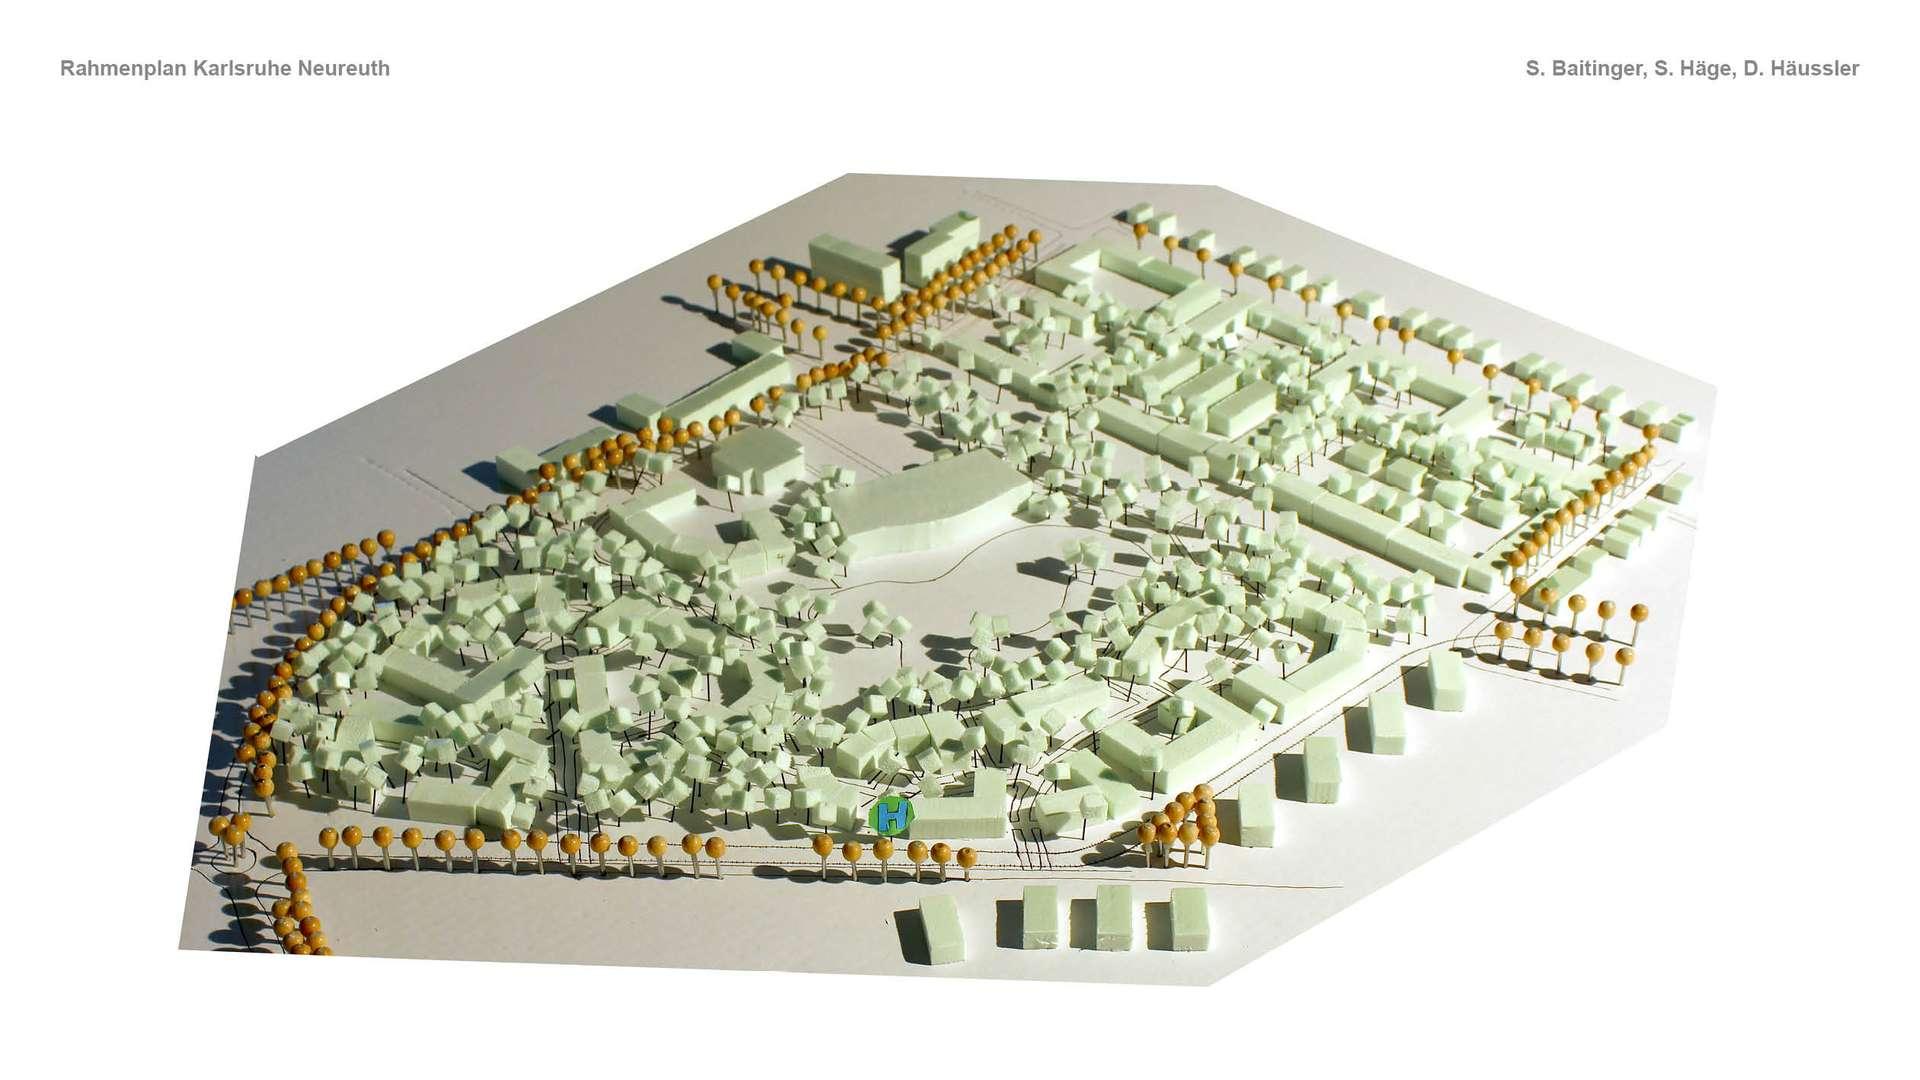 17 Rahmenkonzept Karlsruhe Neureuth